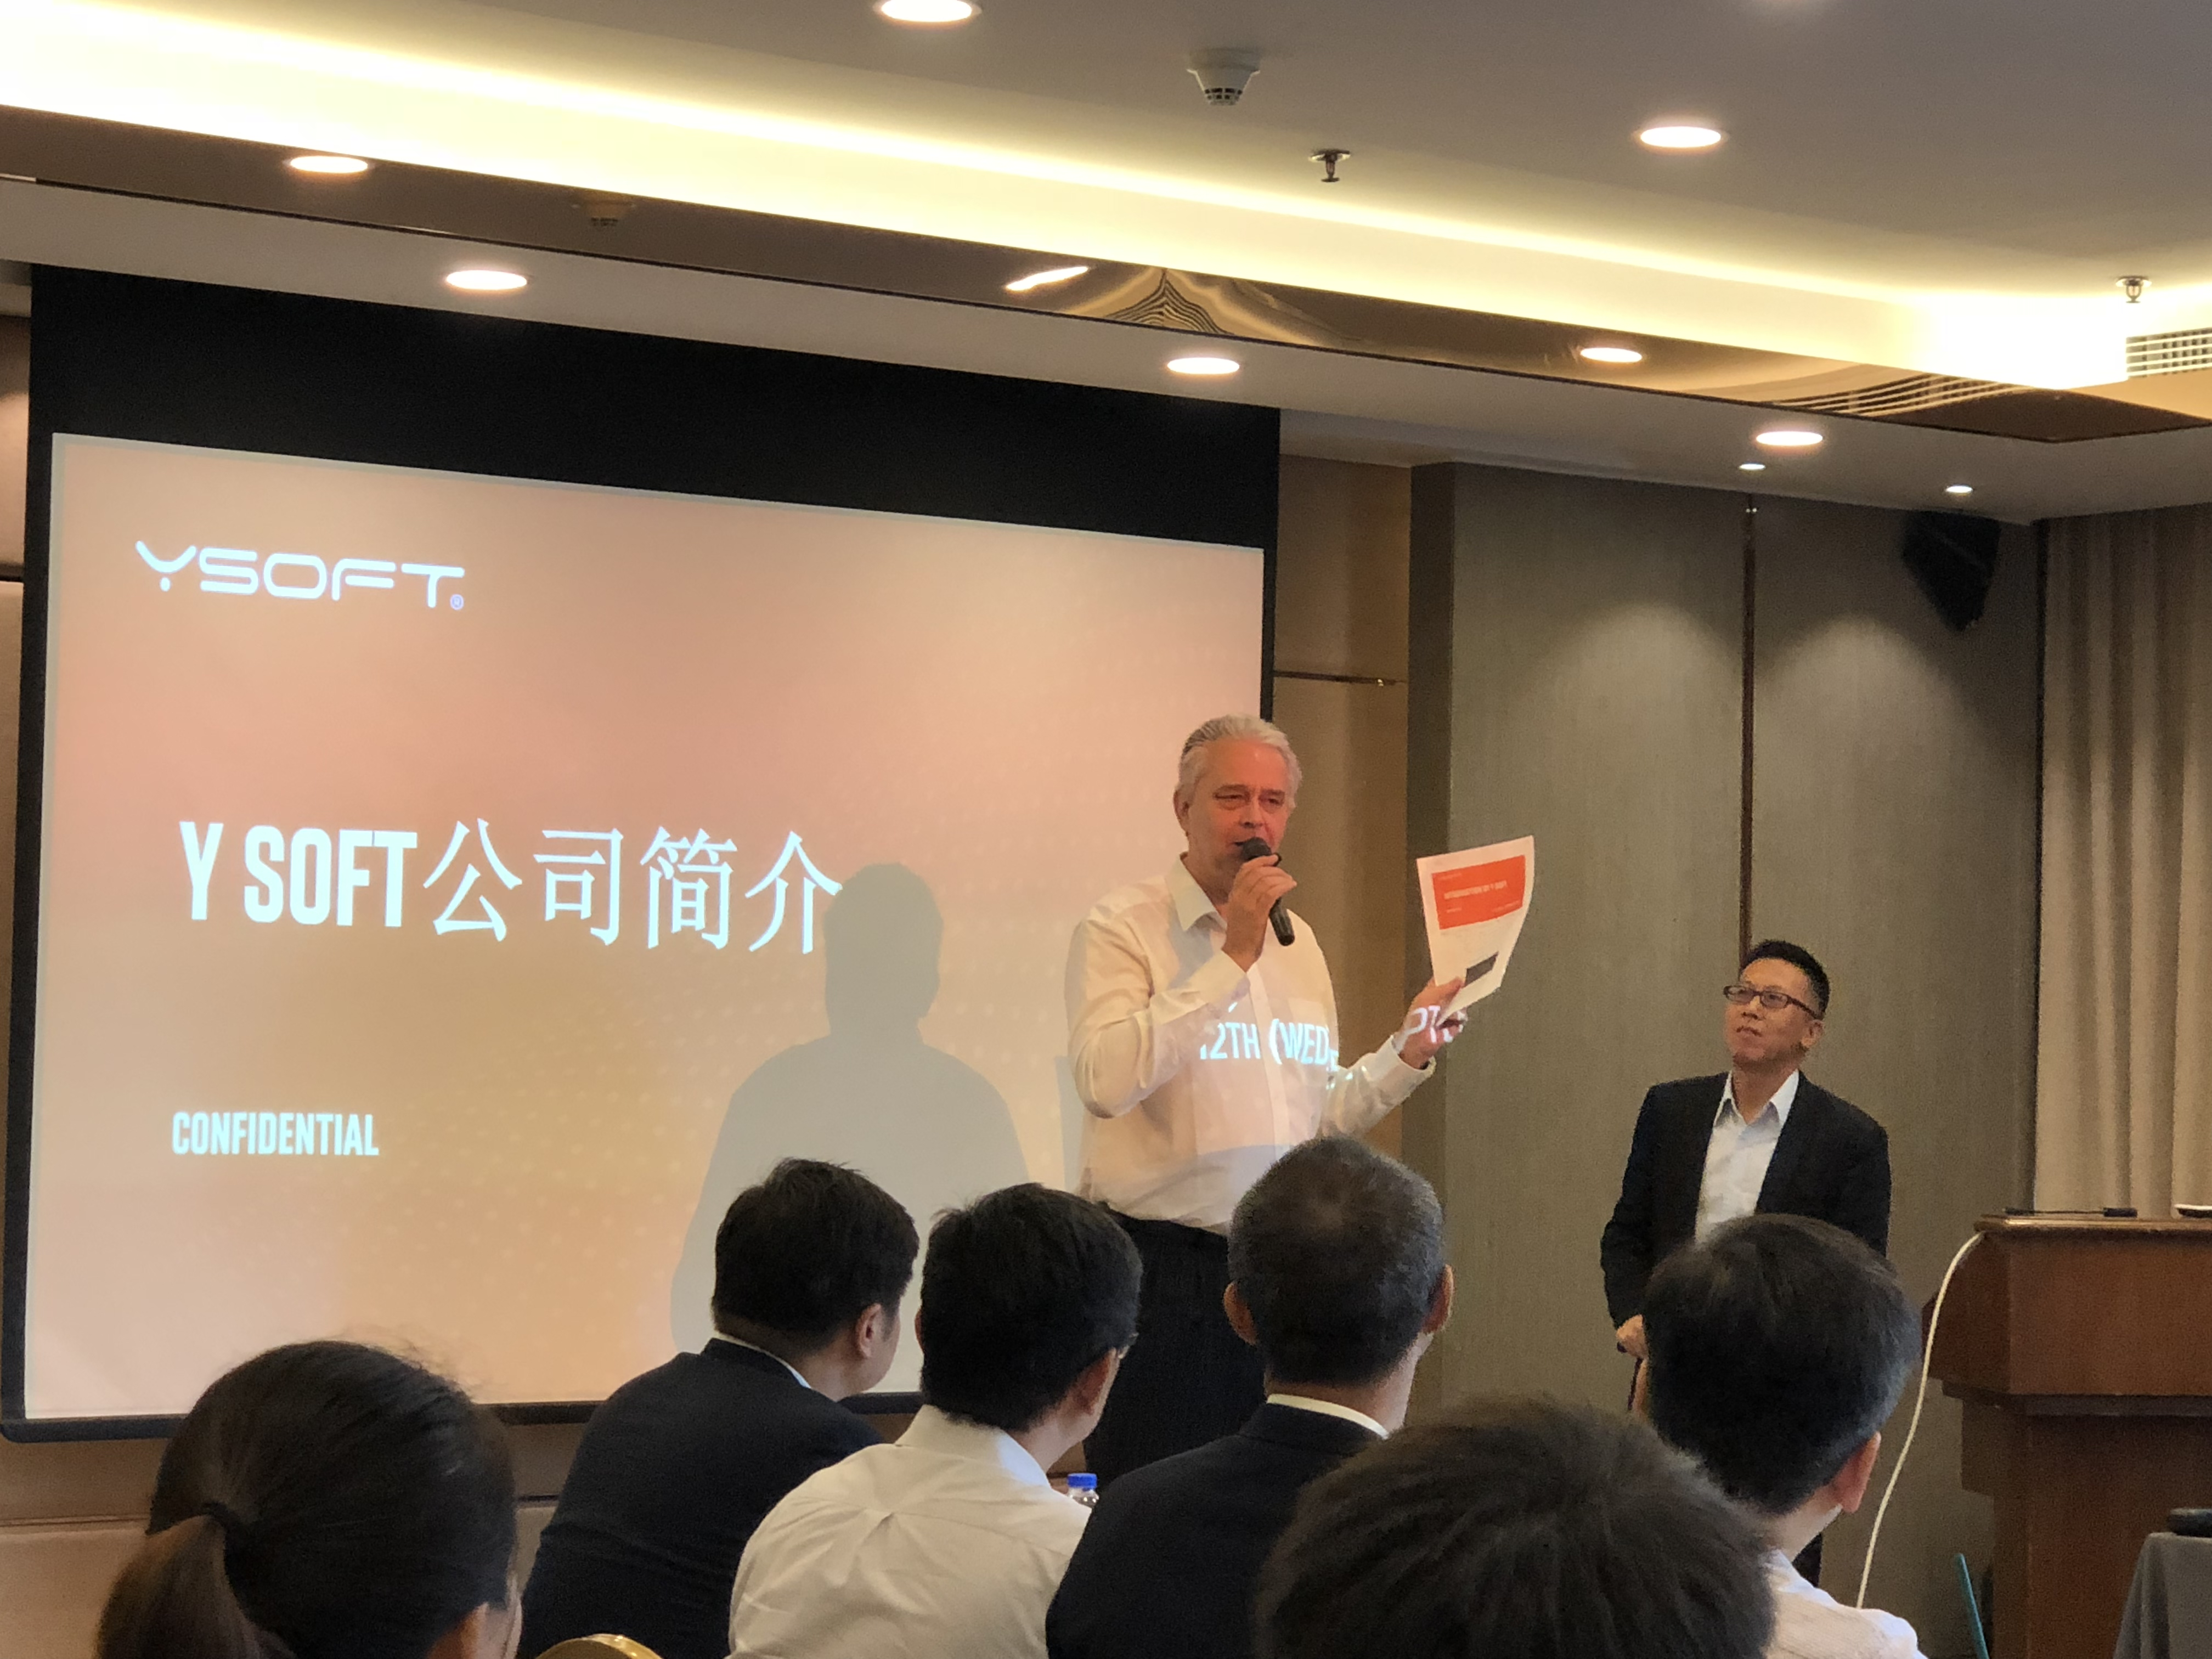 YSoft亚太区执行Milan Fujita先生介绍物联网概念